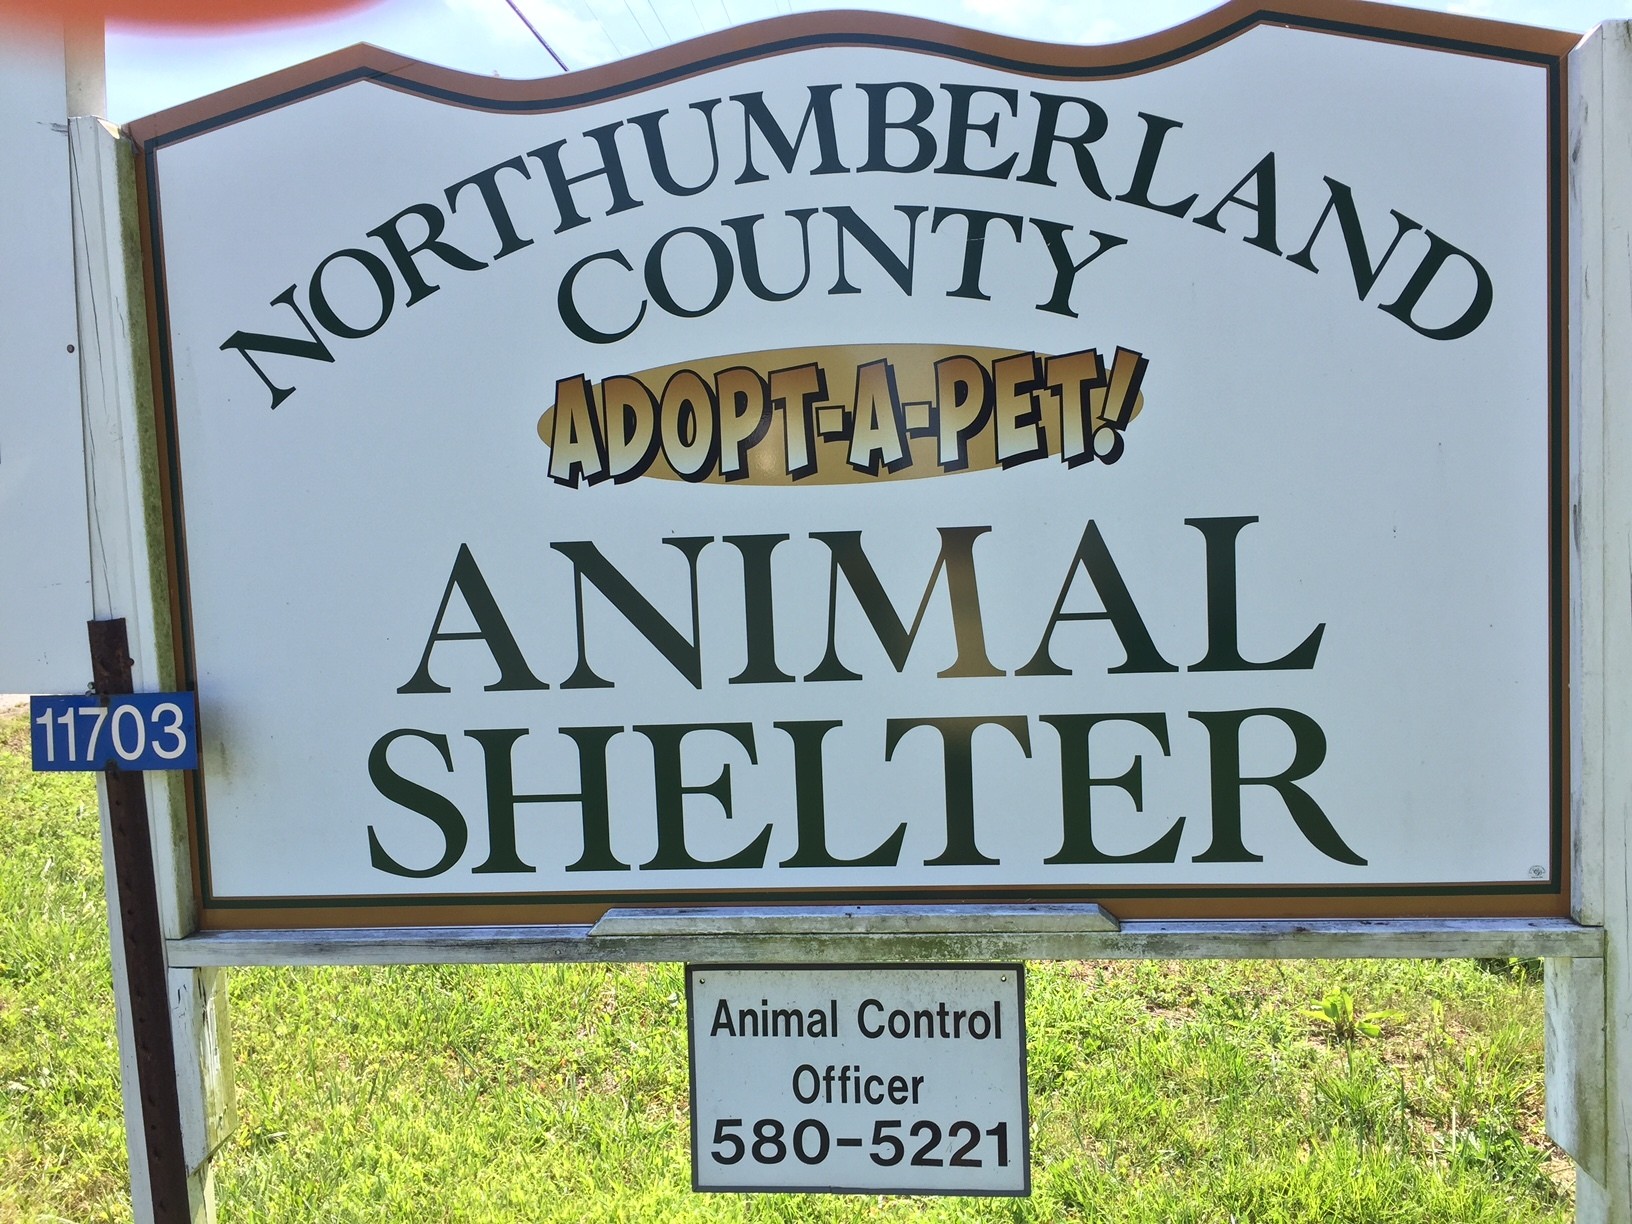 Northumberland County Animal Shelter